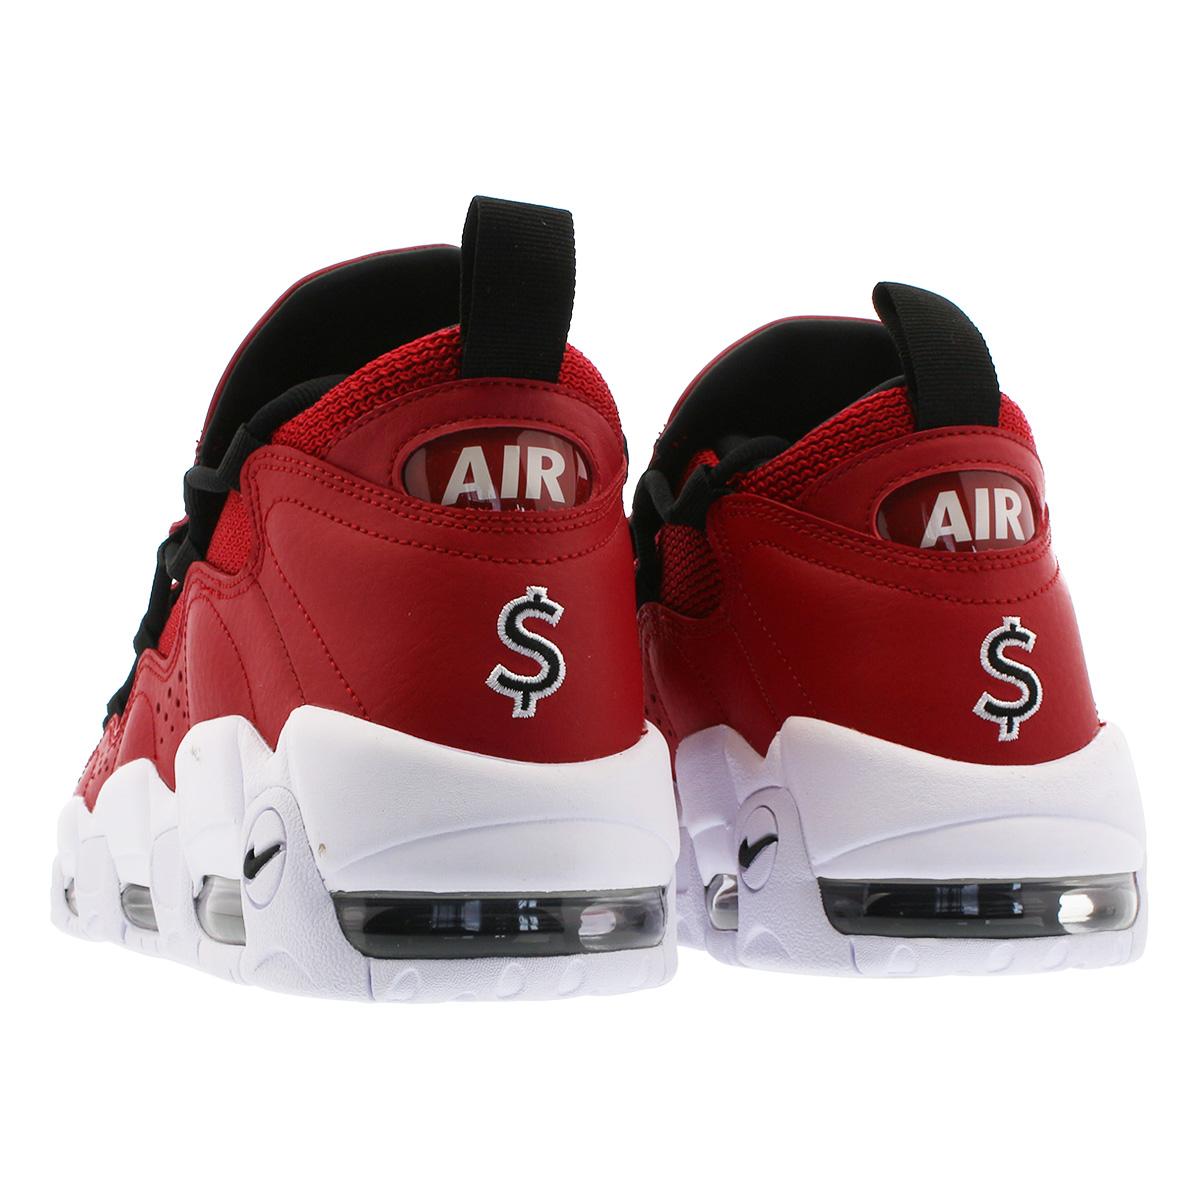 6ec460cb717fc2 SELECT SHOP LOWTEX  NIKE AIR MORE MONEY Nike air more money GYM RED ...